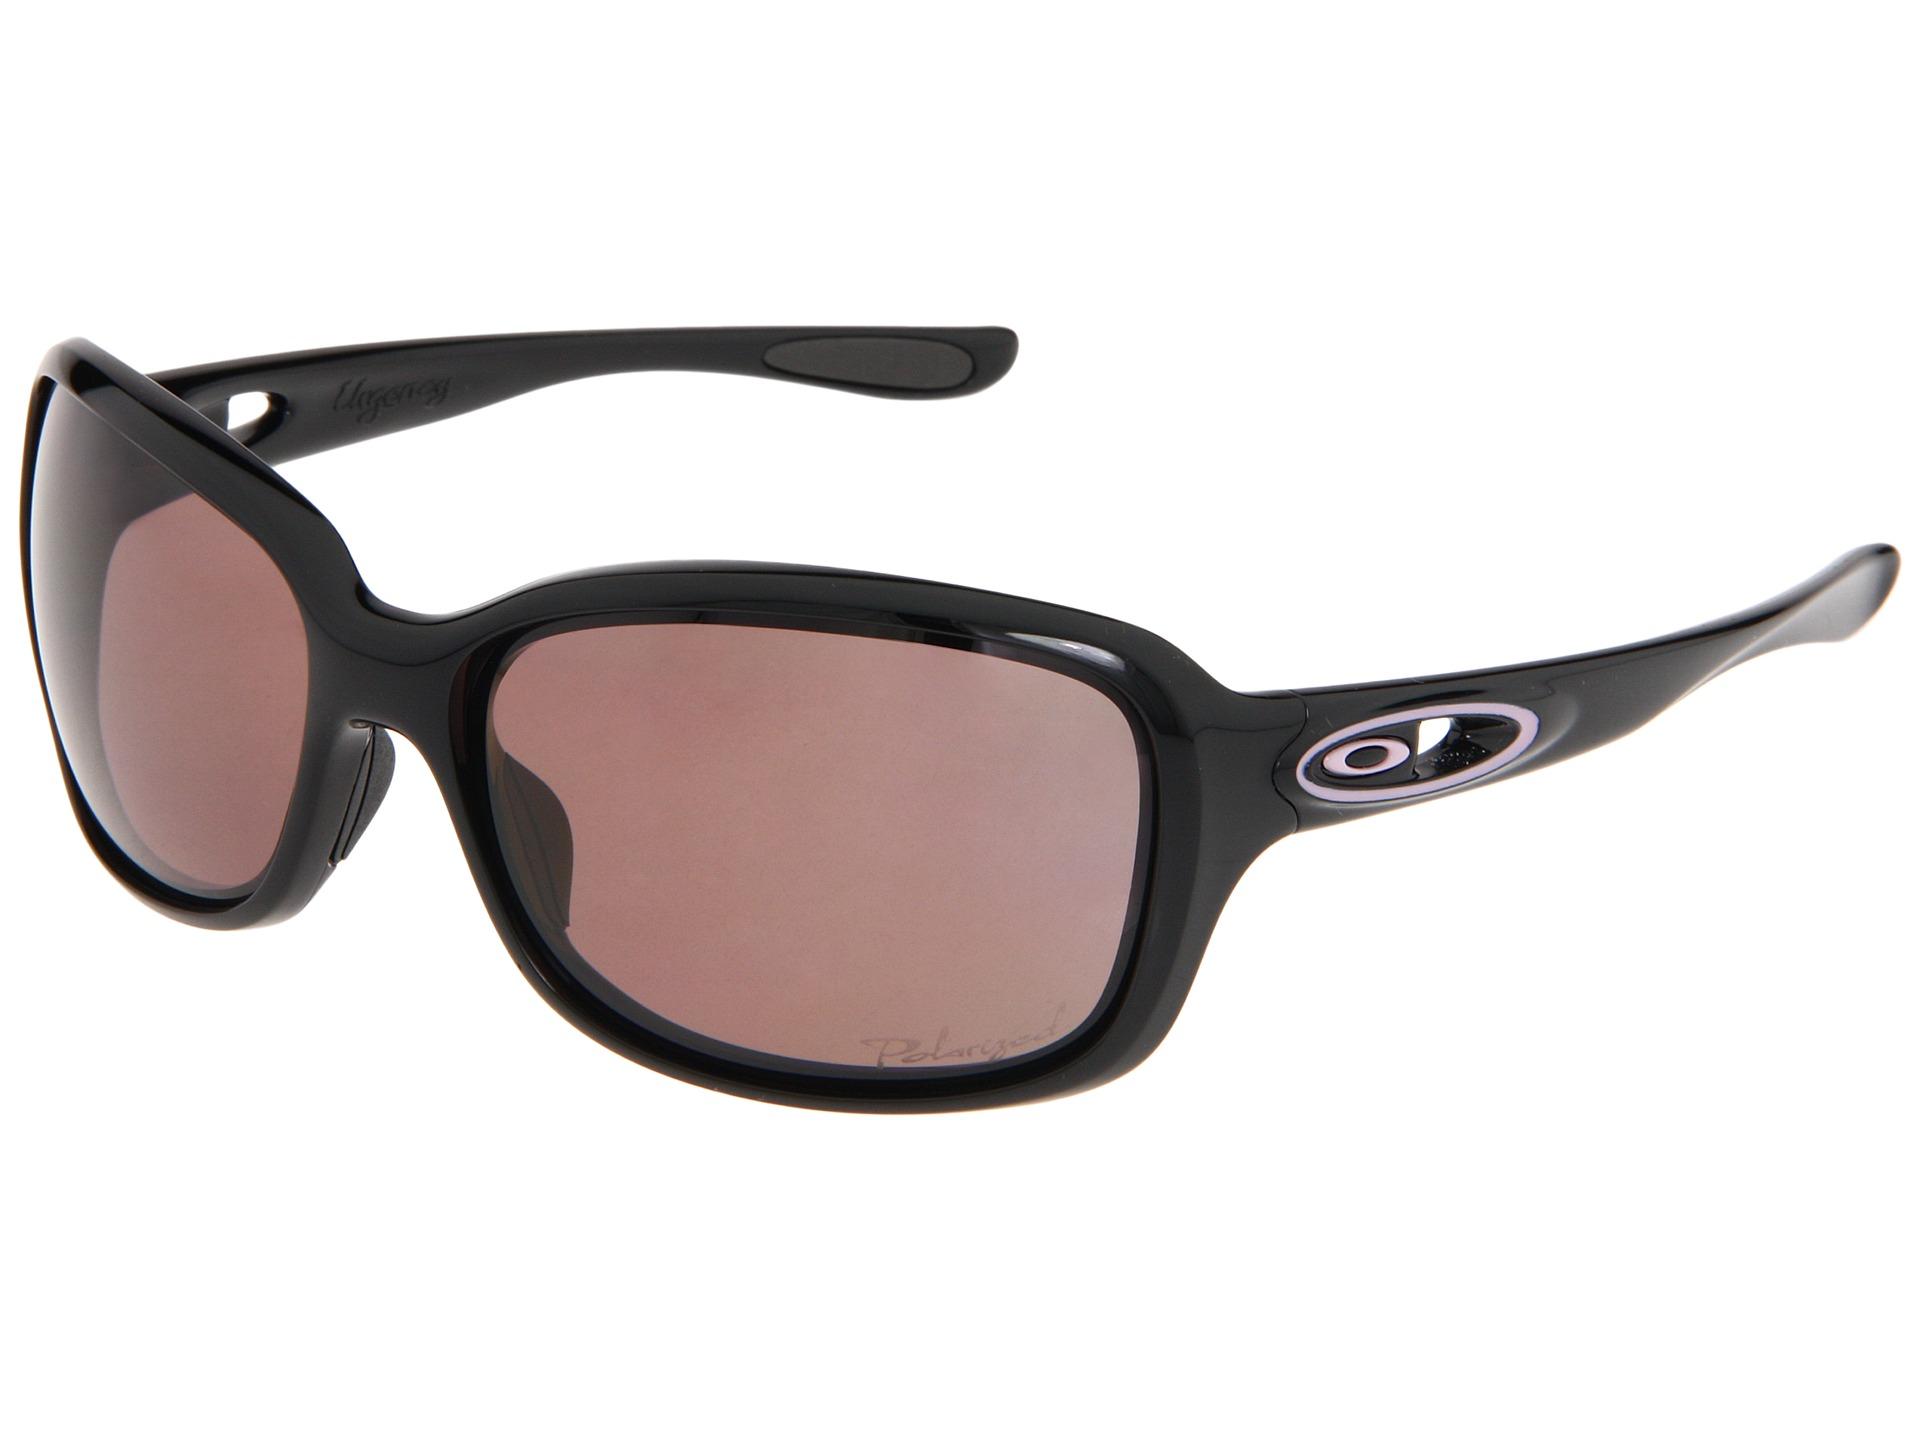 7a20c0b6ea Oakley Urgency Sunglasses Polarized « Heritage Malta